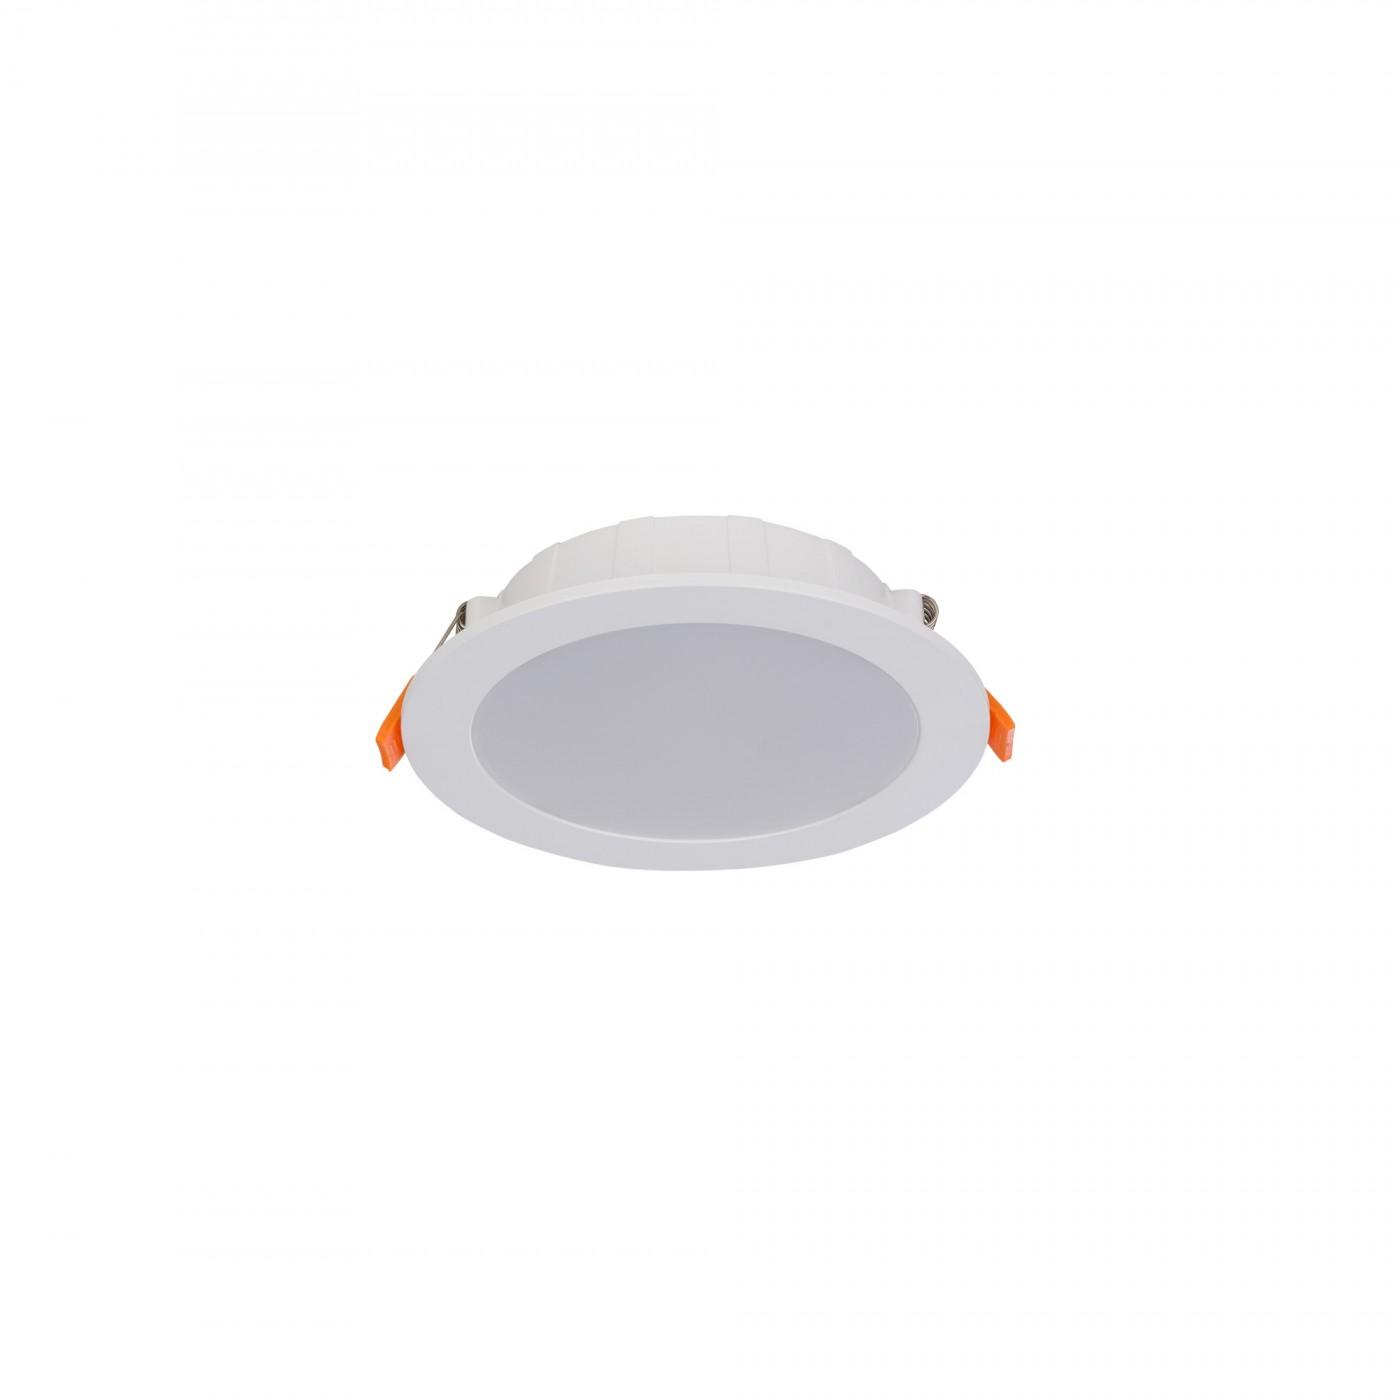 CL KOS LED 10W 4000K 8778 Nowodvorski Lighting